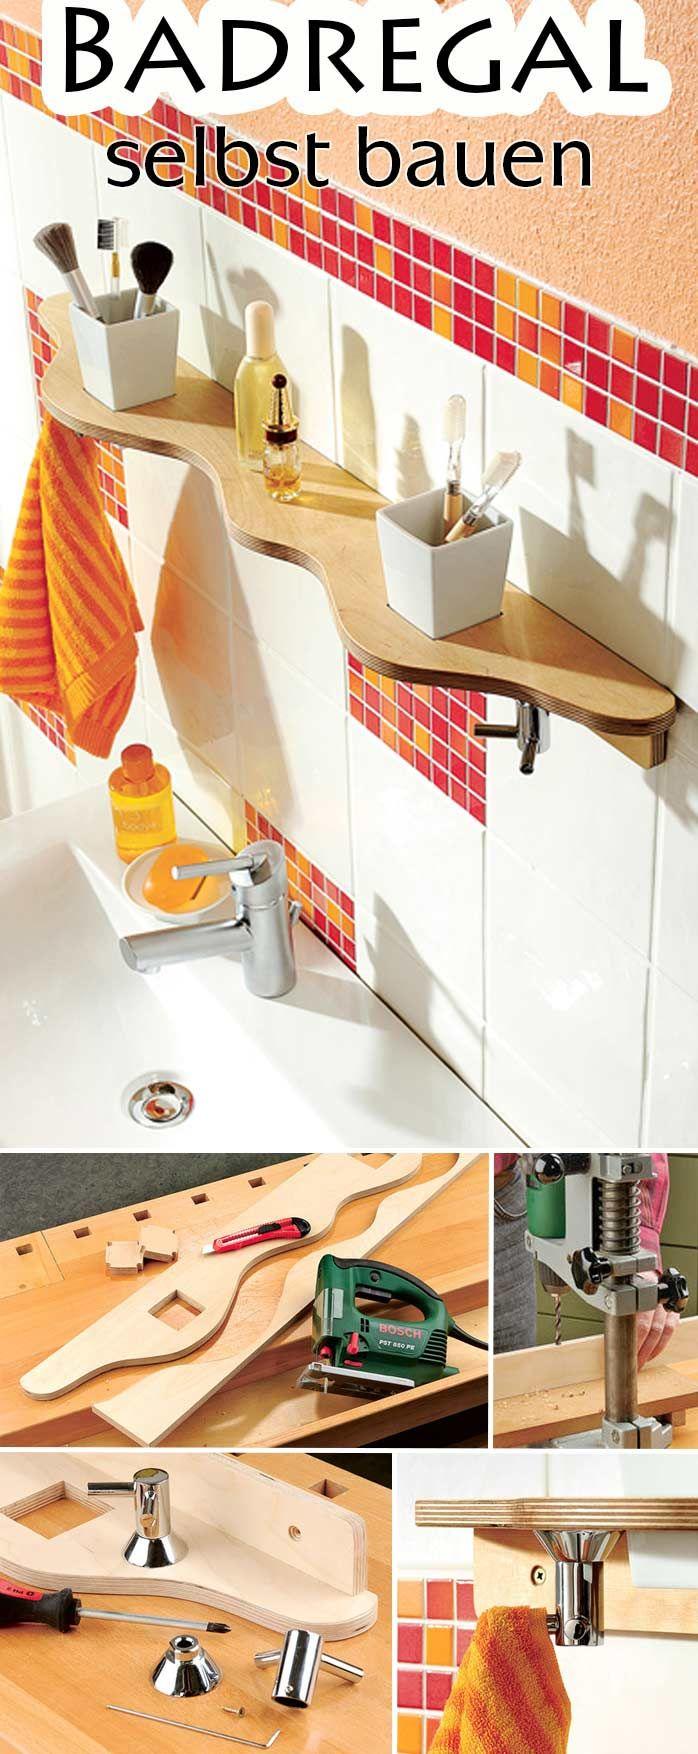 57 melhores imagens de regale schr nke no pinterest 230 arm rios e marcenaria. Black Bedroom Furniture Sets. Home Design Ideas